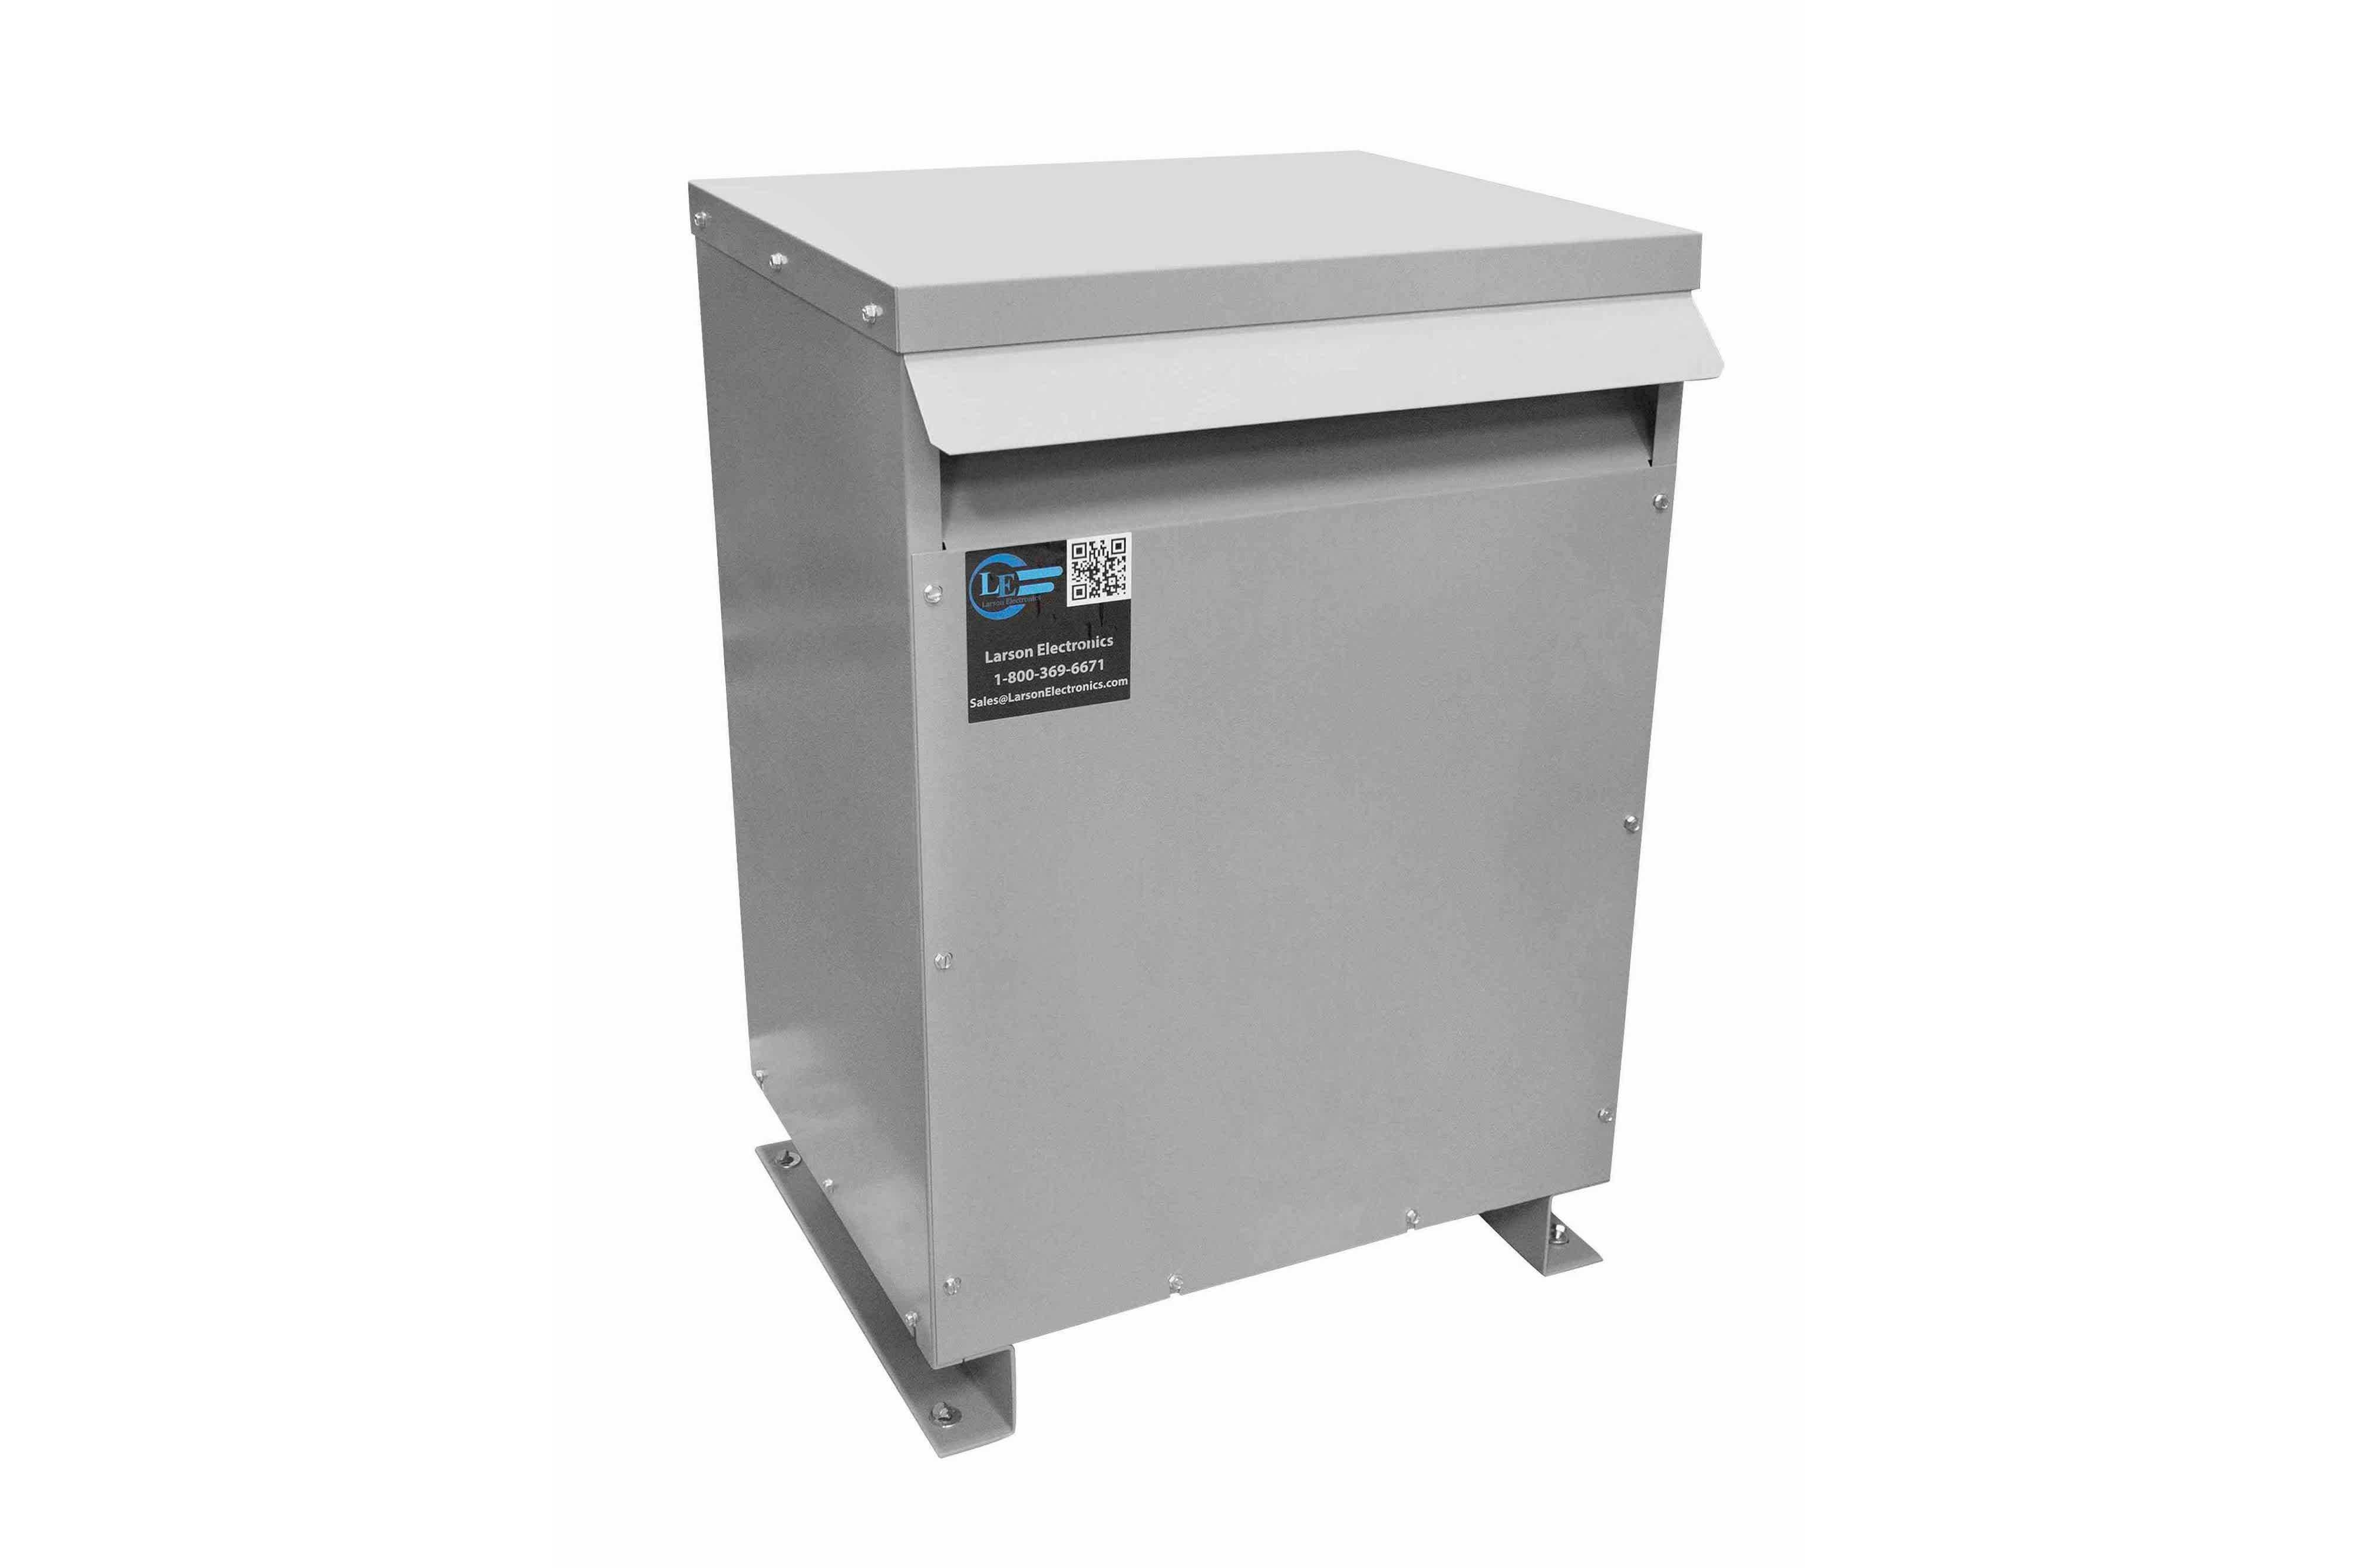 1000 kVA 3PH Isolation Transformer, 400V Wye Primary, 600V Delta Secondary, N3R, Ventilated, 60 Hz